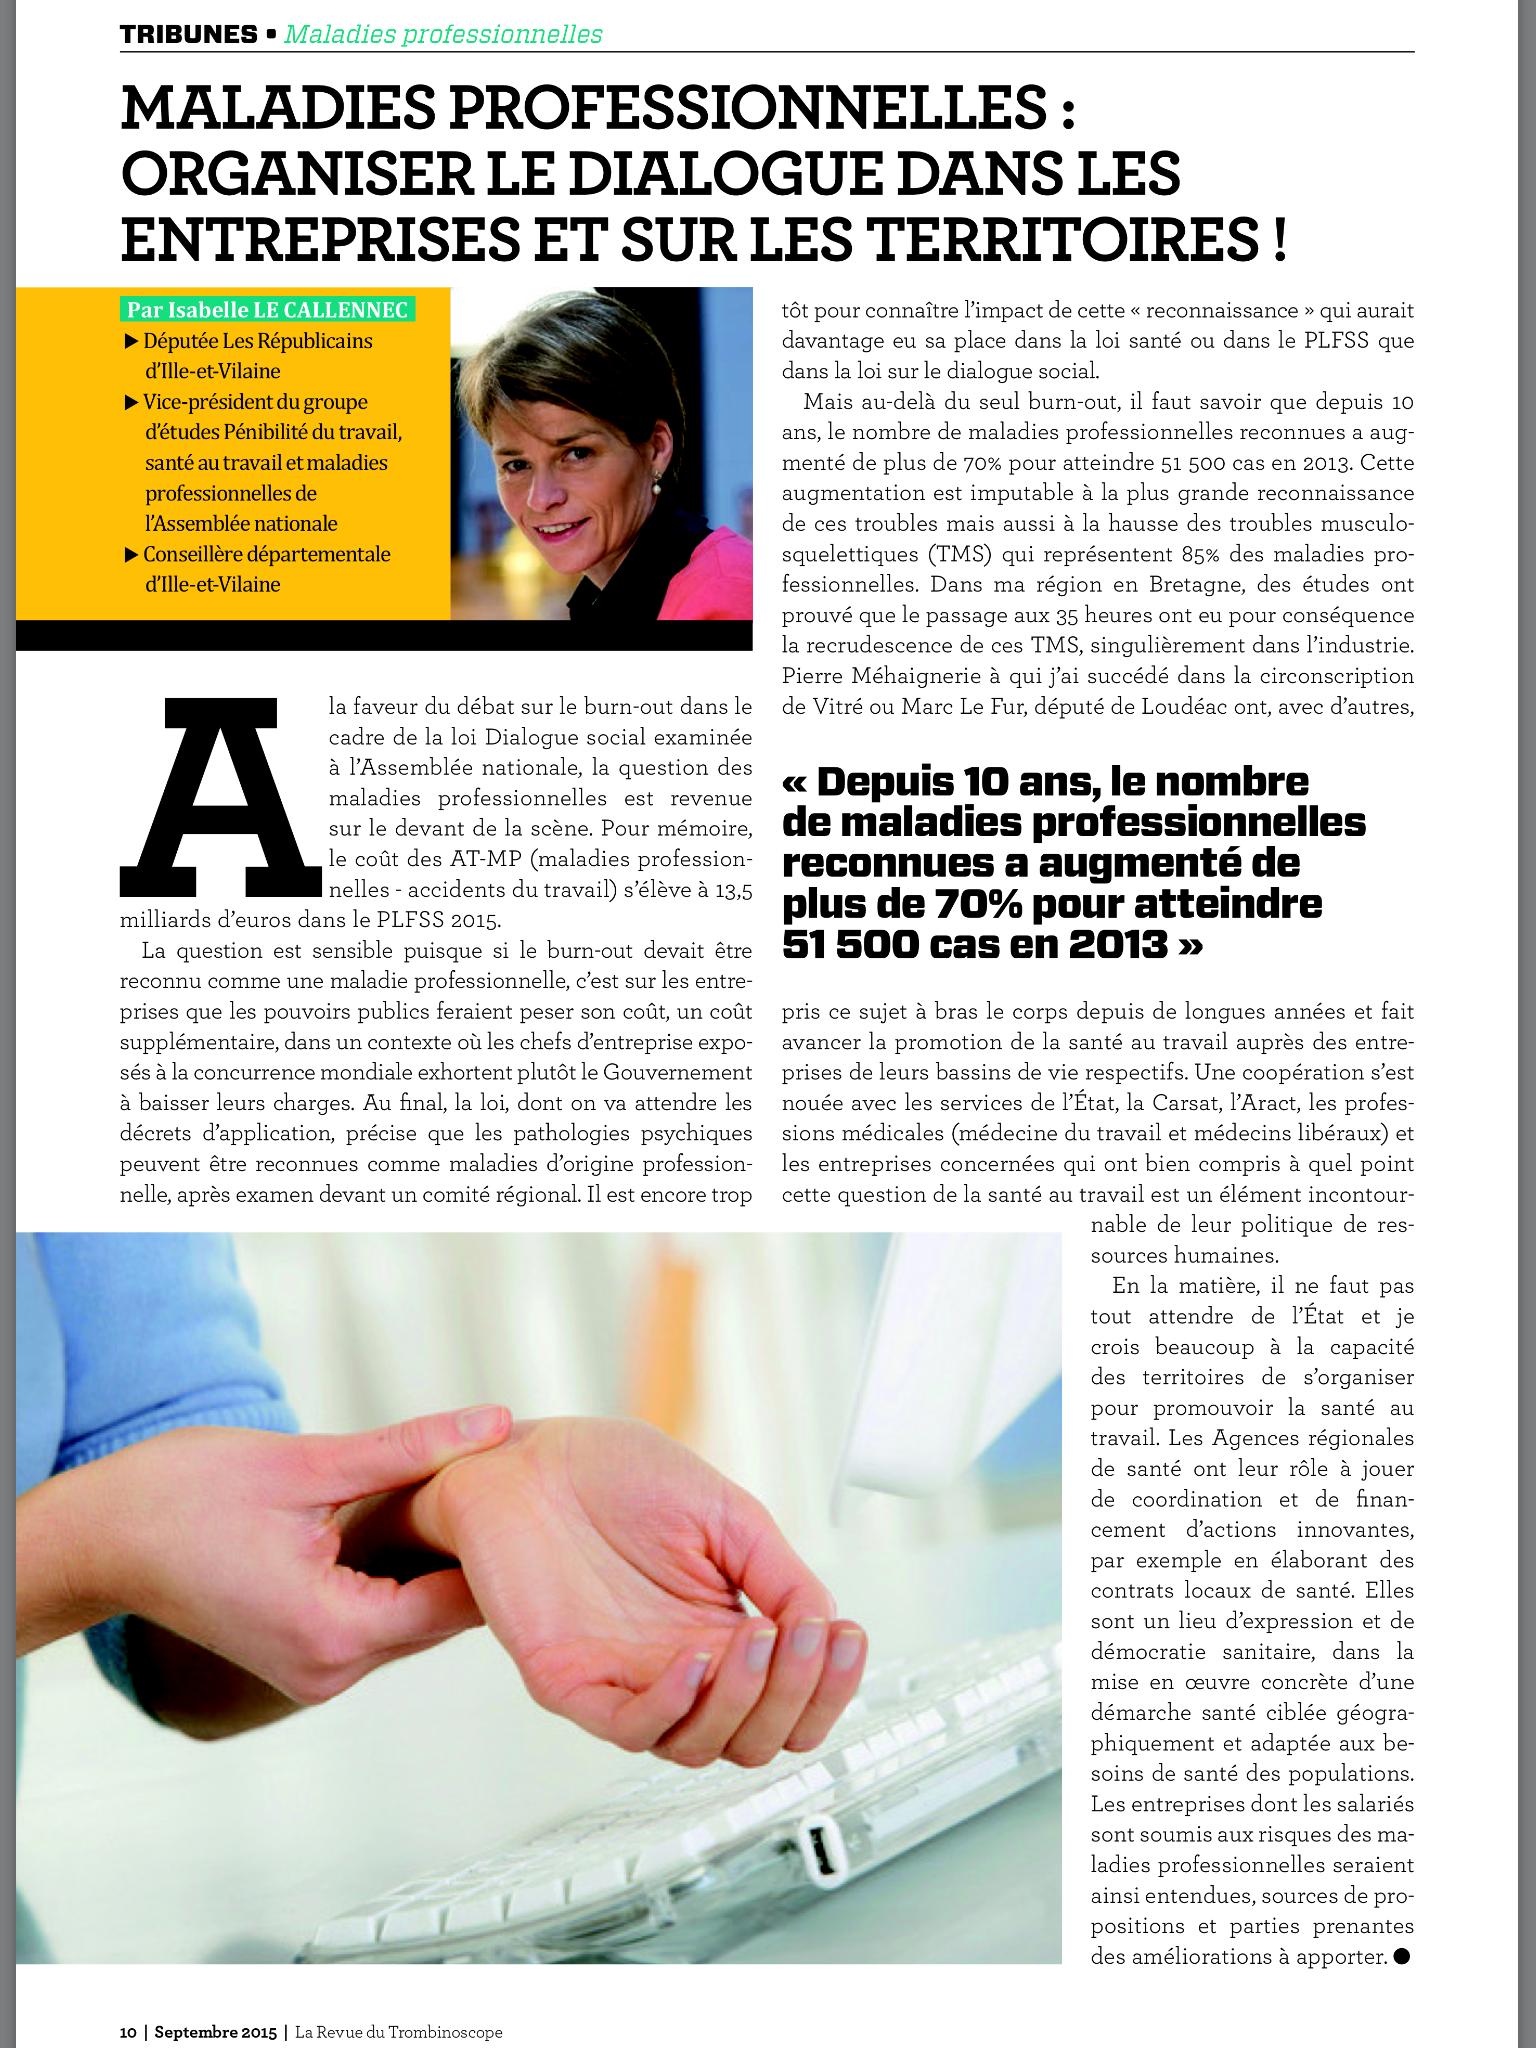 Tribune Maladies Professionnelles - Trombinoscope Septembre 2015